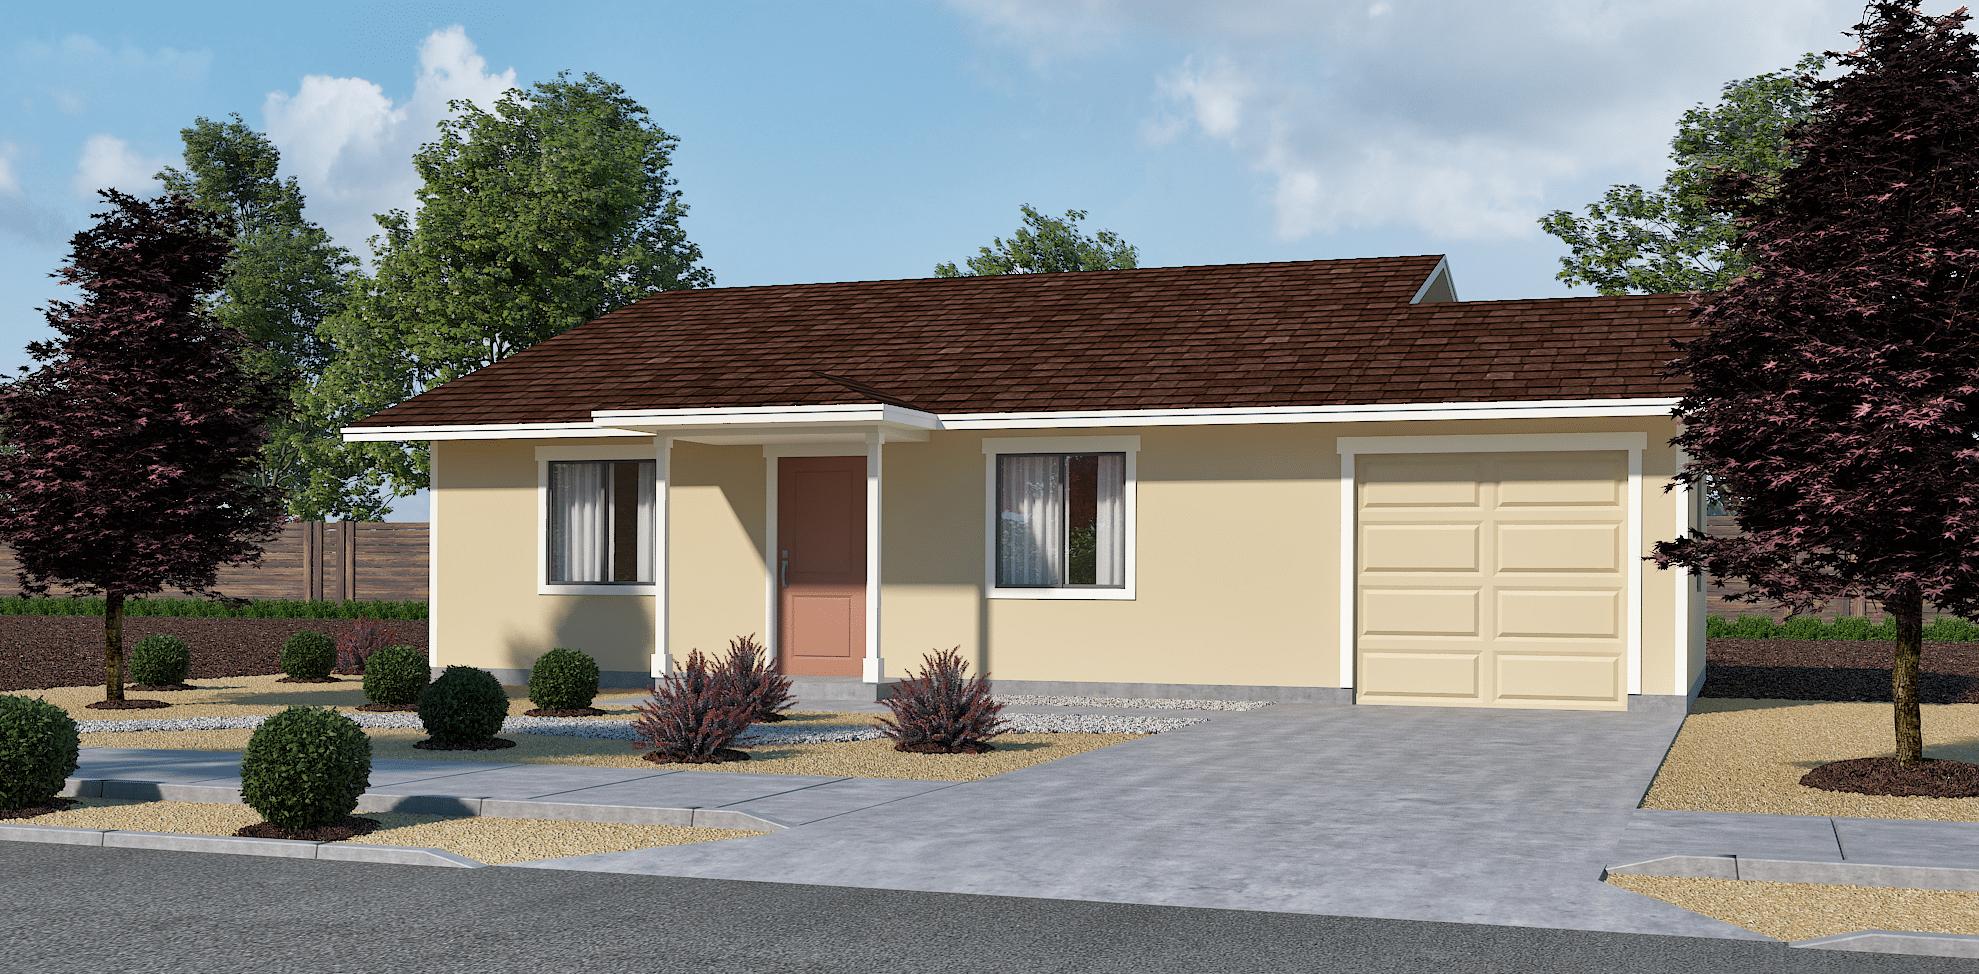 jenuane-communities-nv-flats-rendering-2